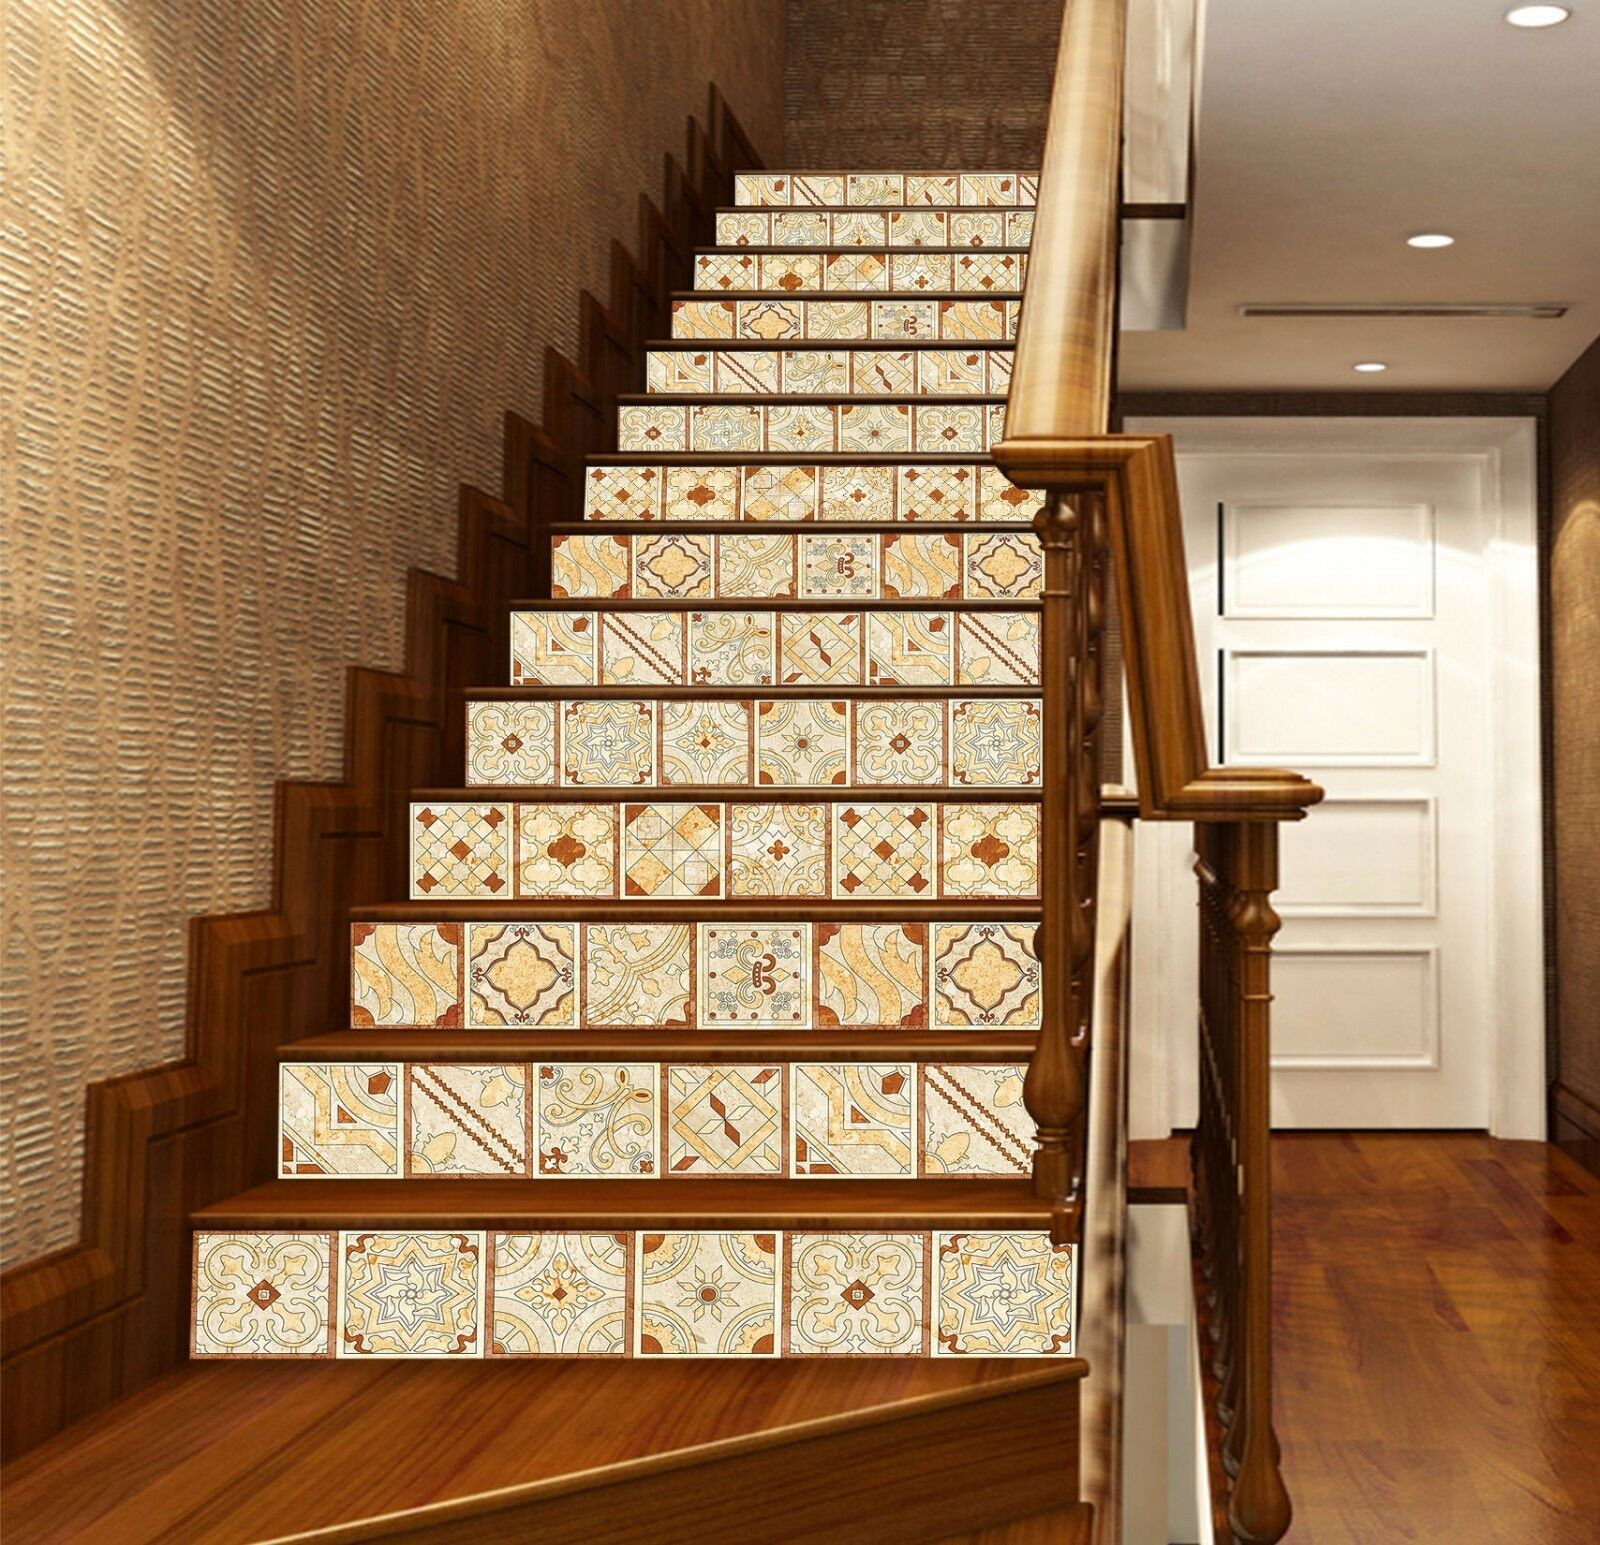 3D Flower 427 Stair Risers Decoration Photo Mural Vinyl Decal Wallpaper UK Lemon